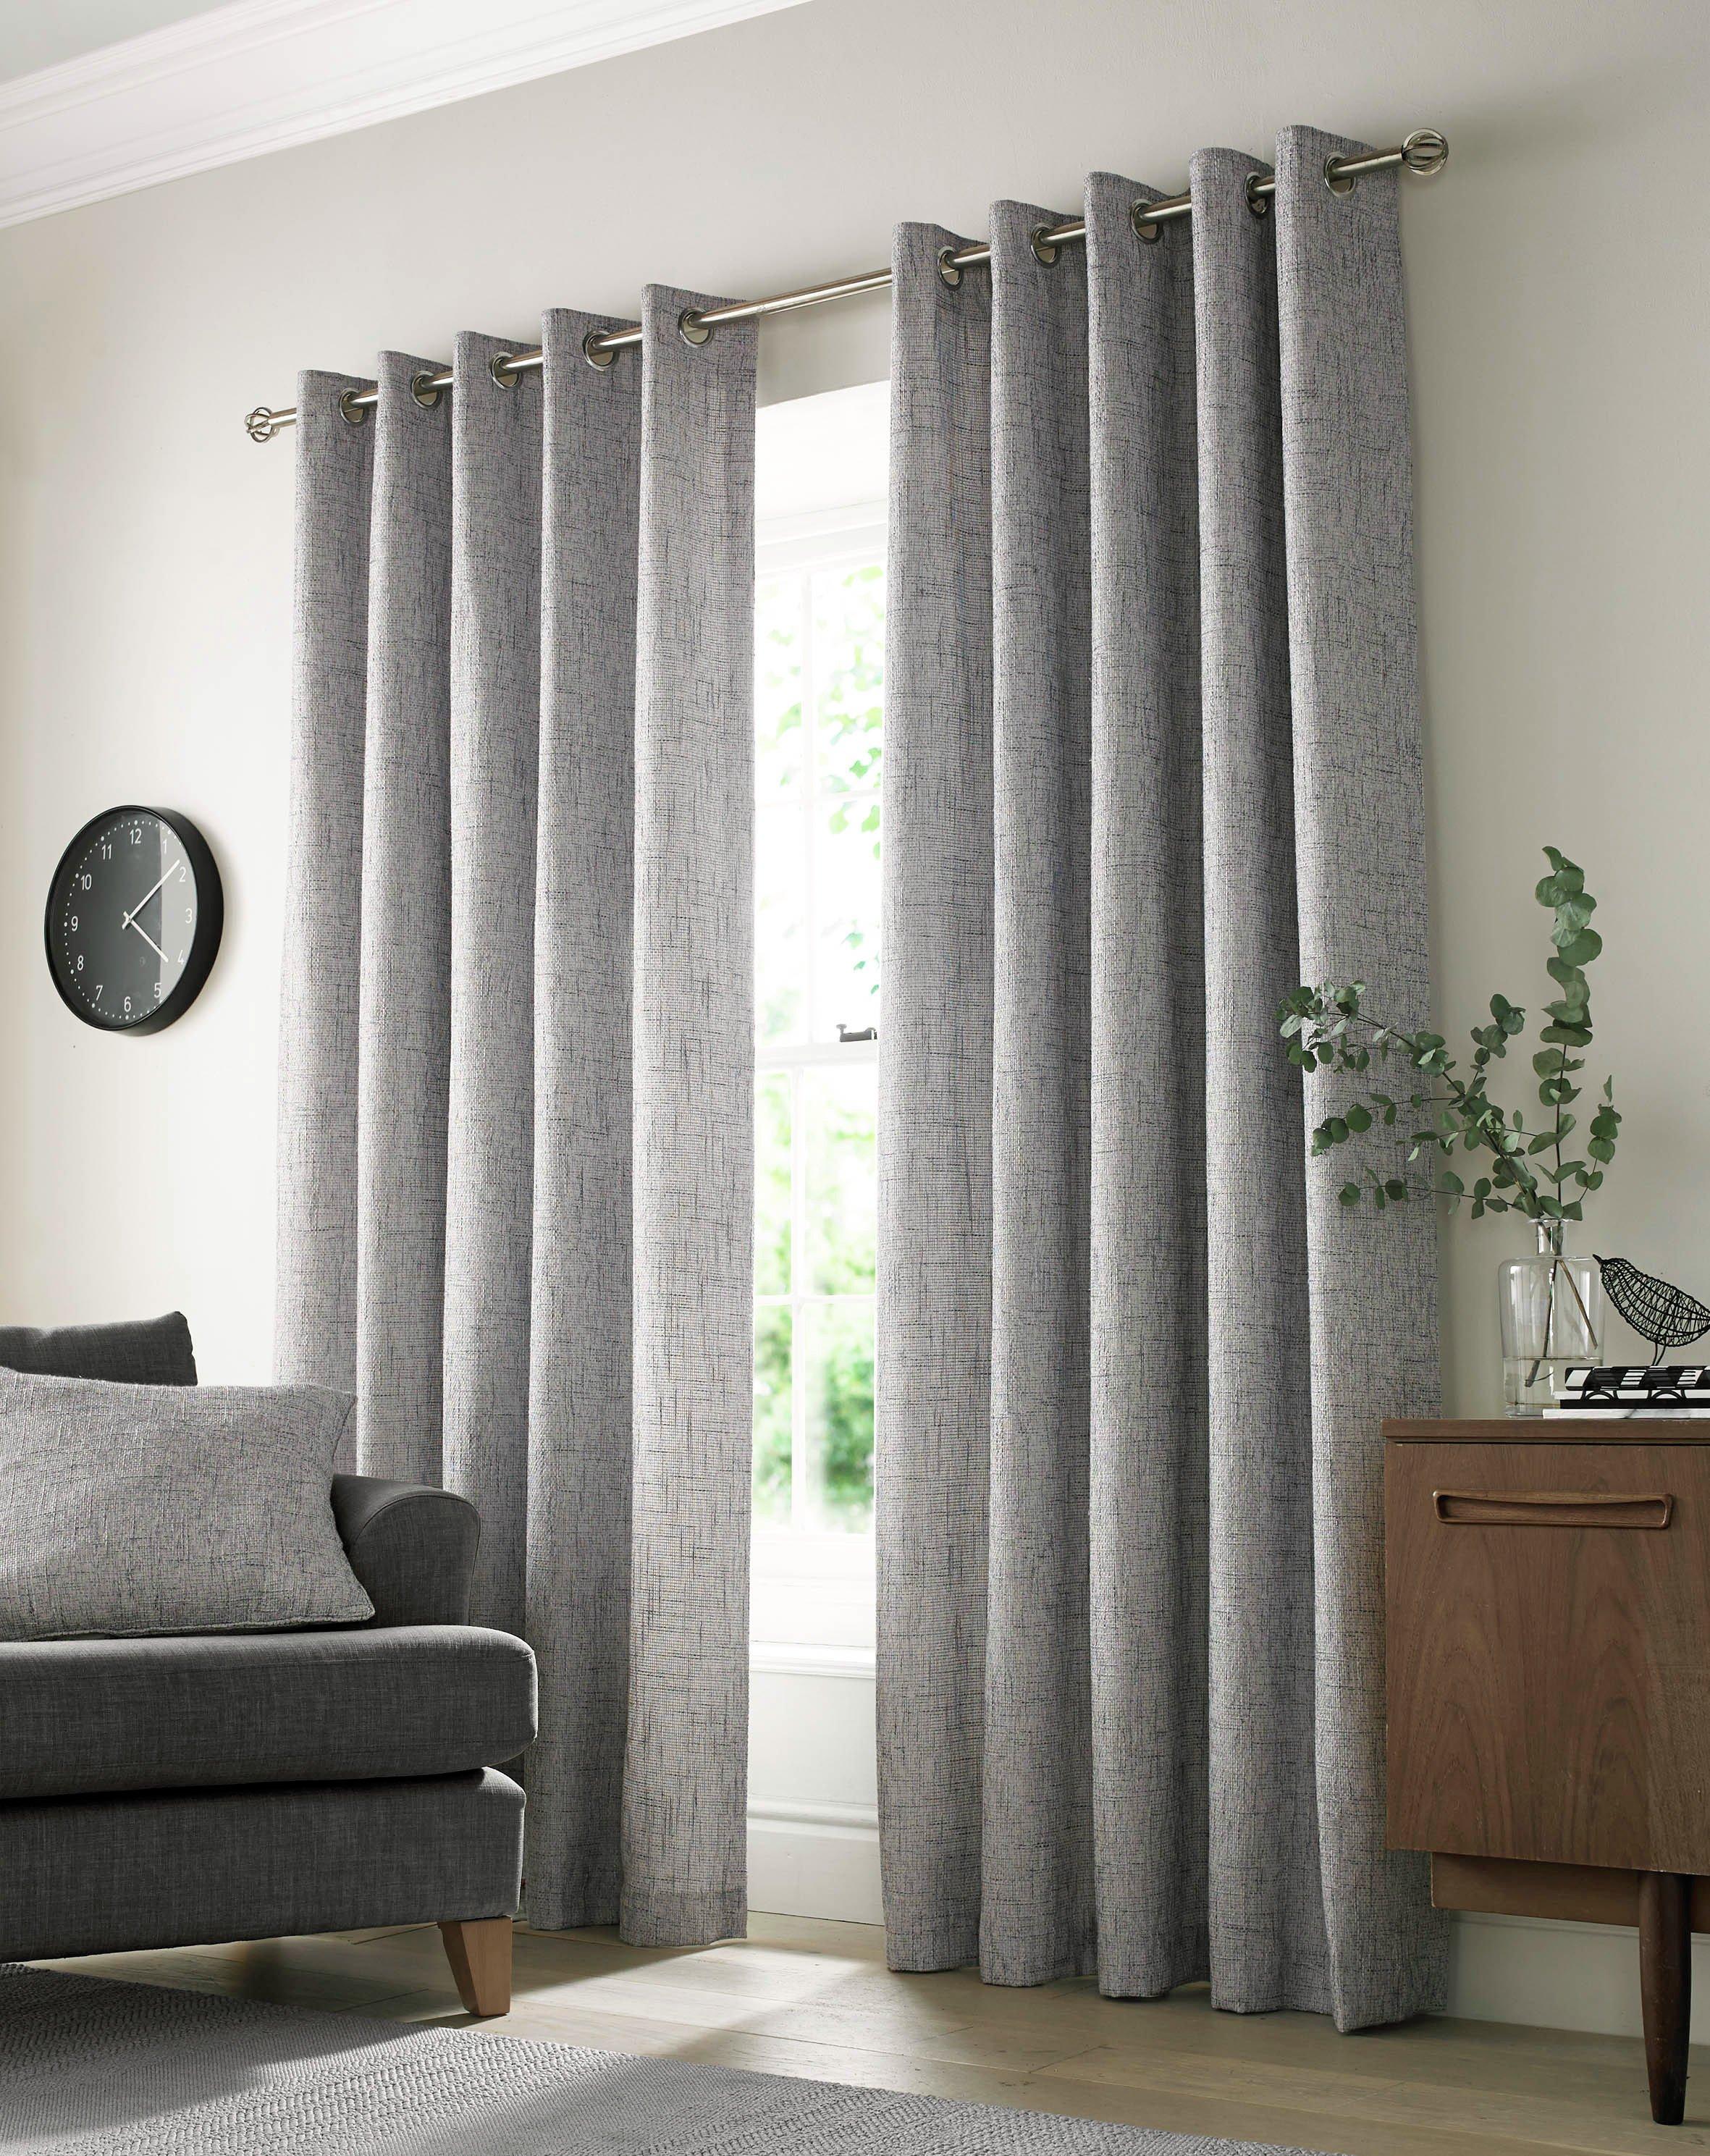 Academy Eyelet Curtains - 165x183cm - Grey.